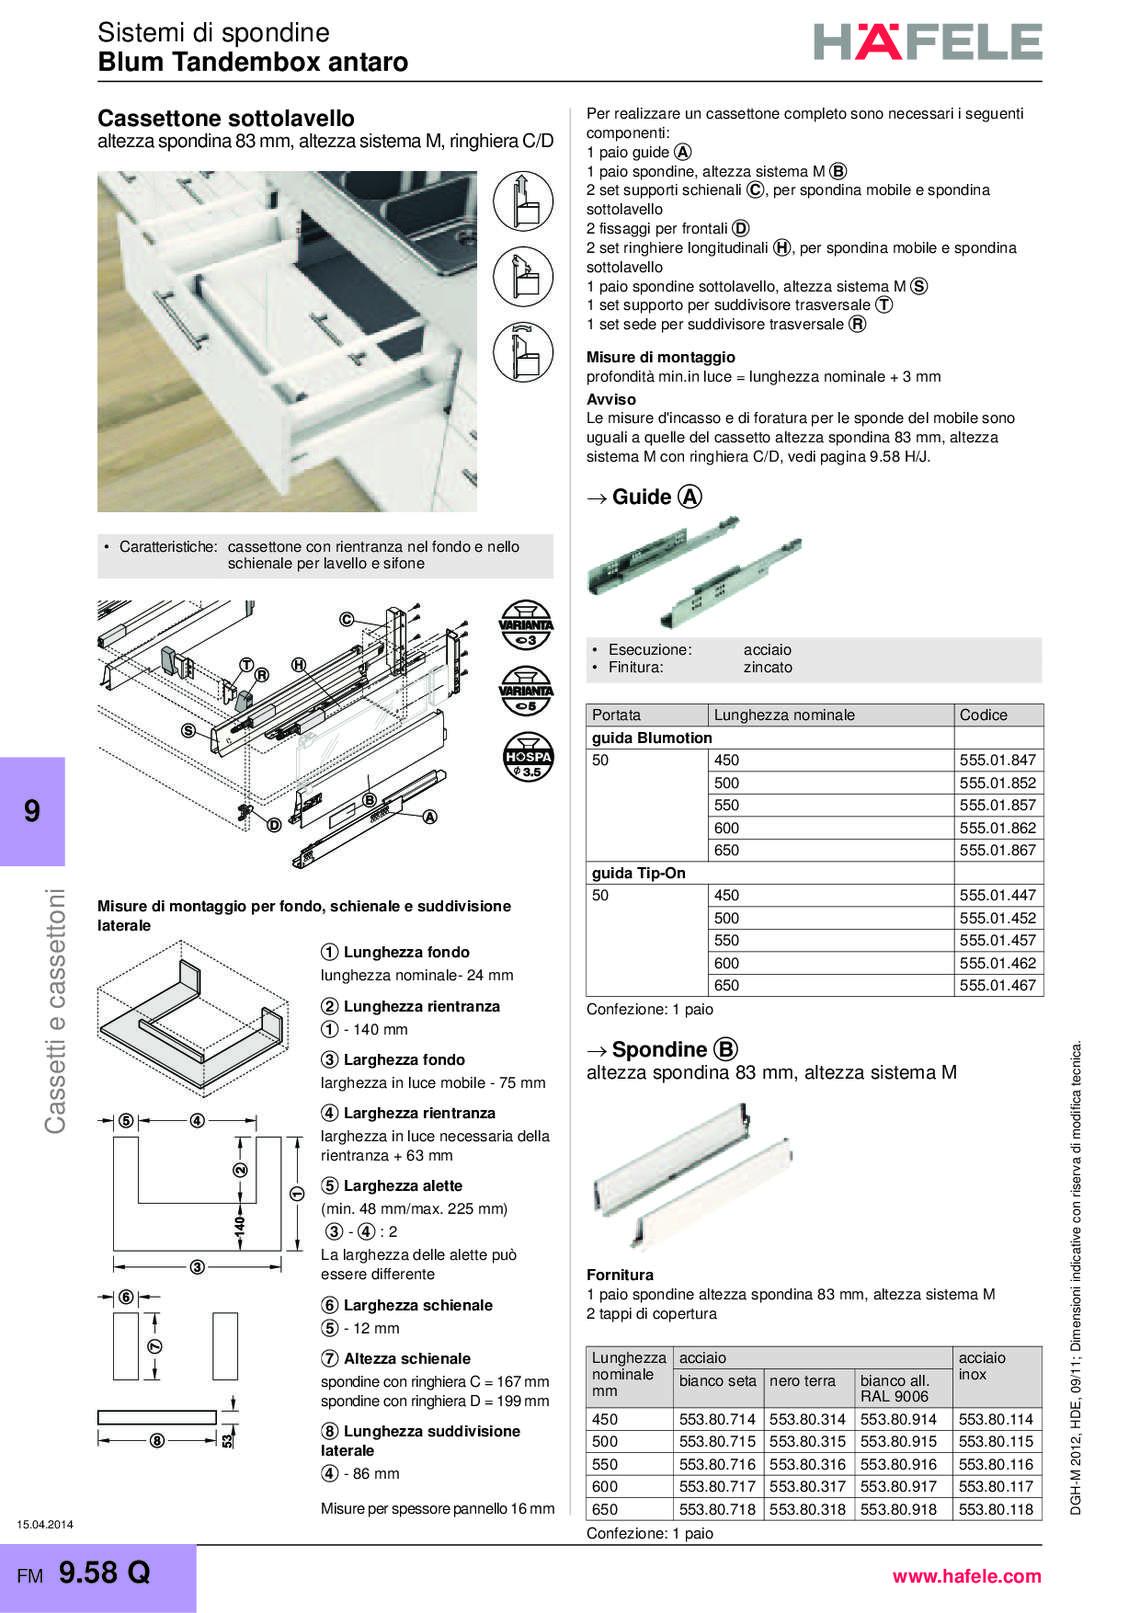 hafele-spondine-e-guide-per-mobili_40_091.jpg